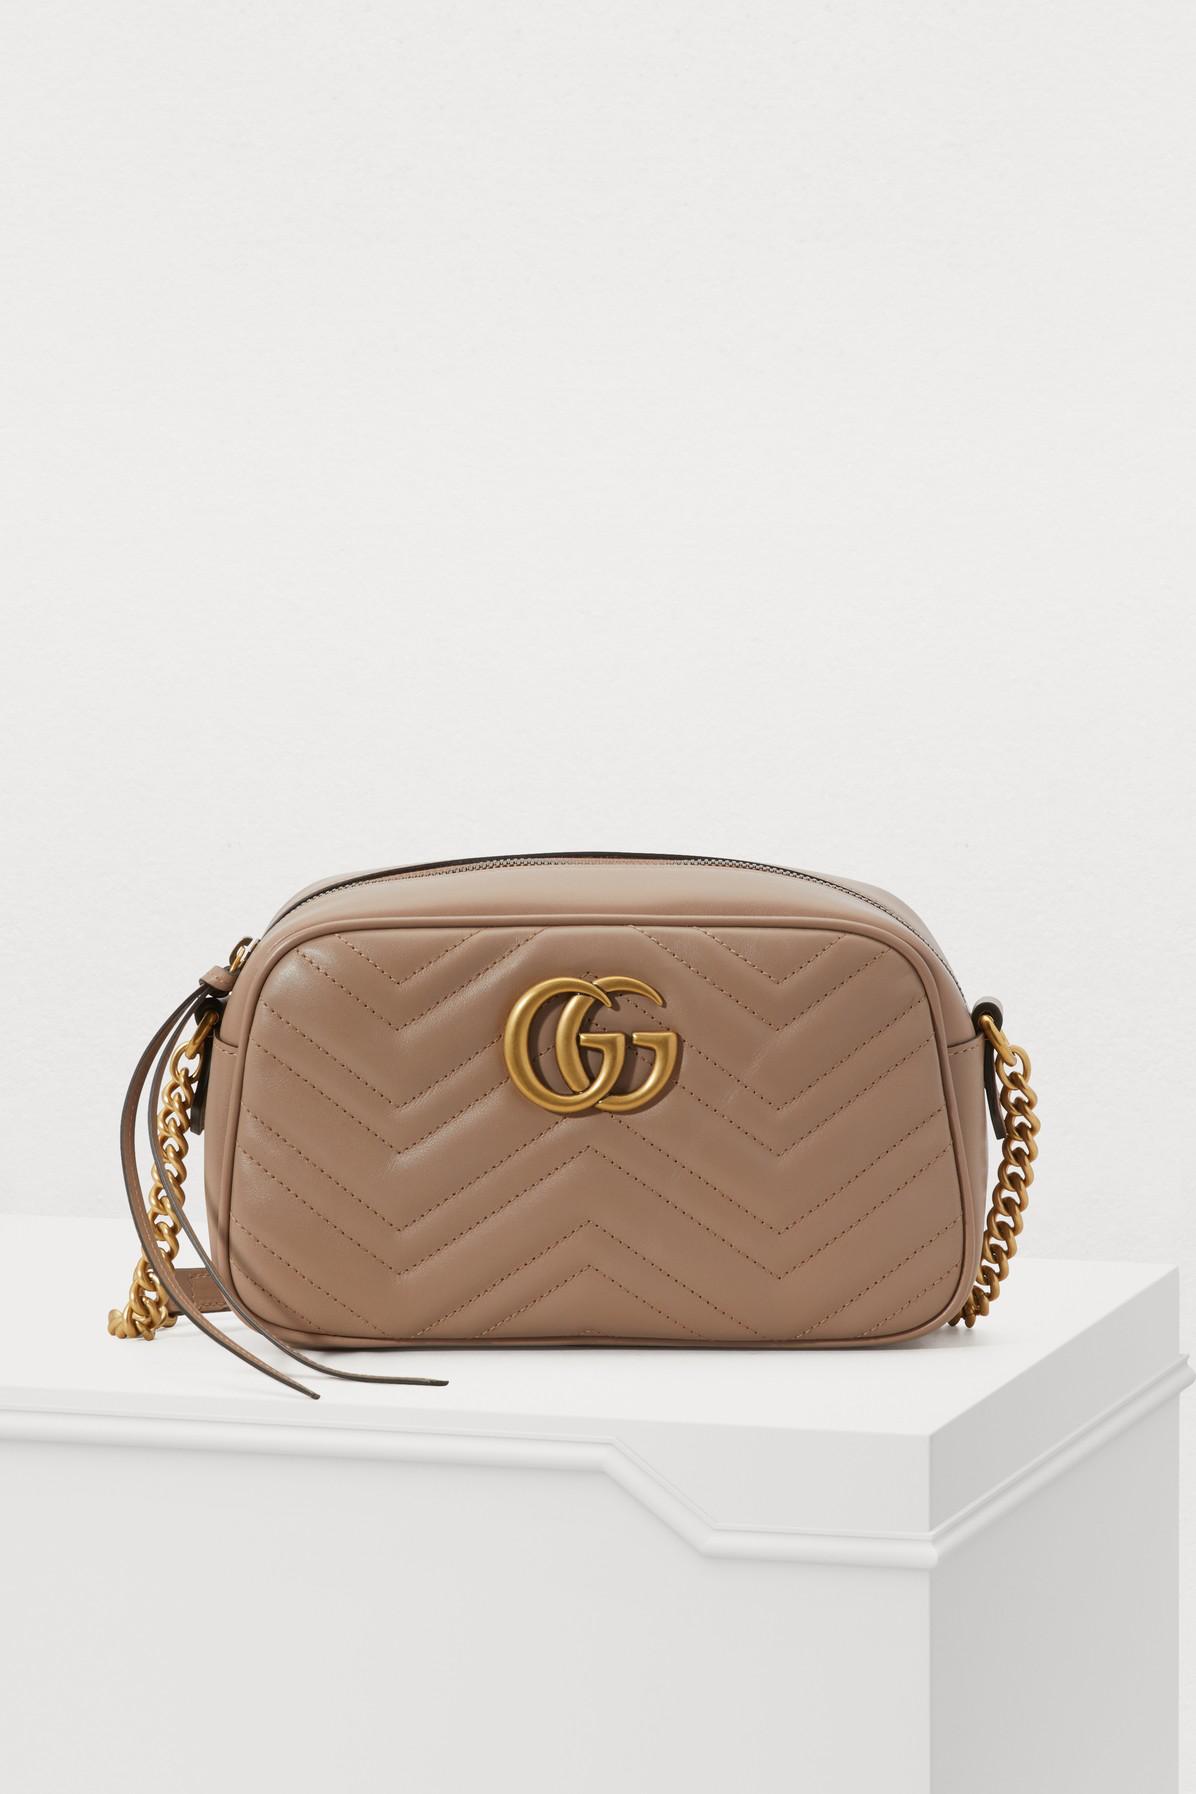 357997ff2a2 Gucci Marmont Gg Crossbody Bag. 24 SÈVRES